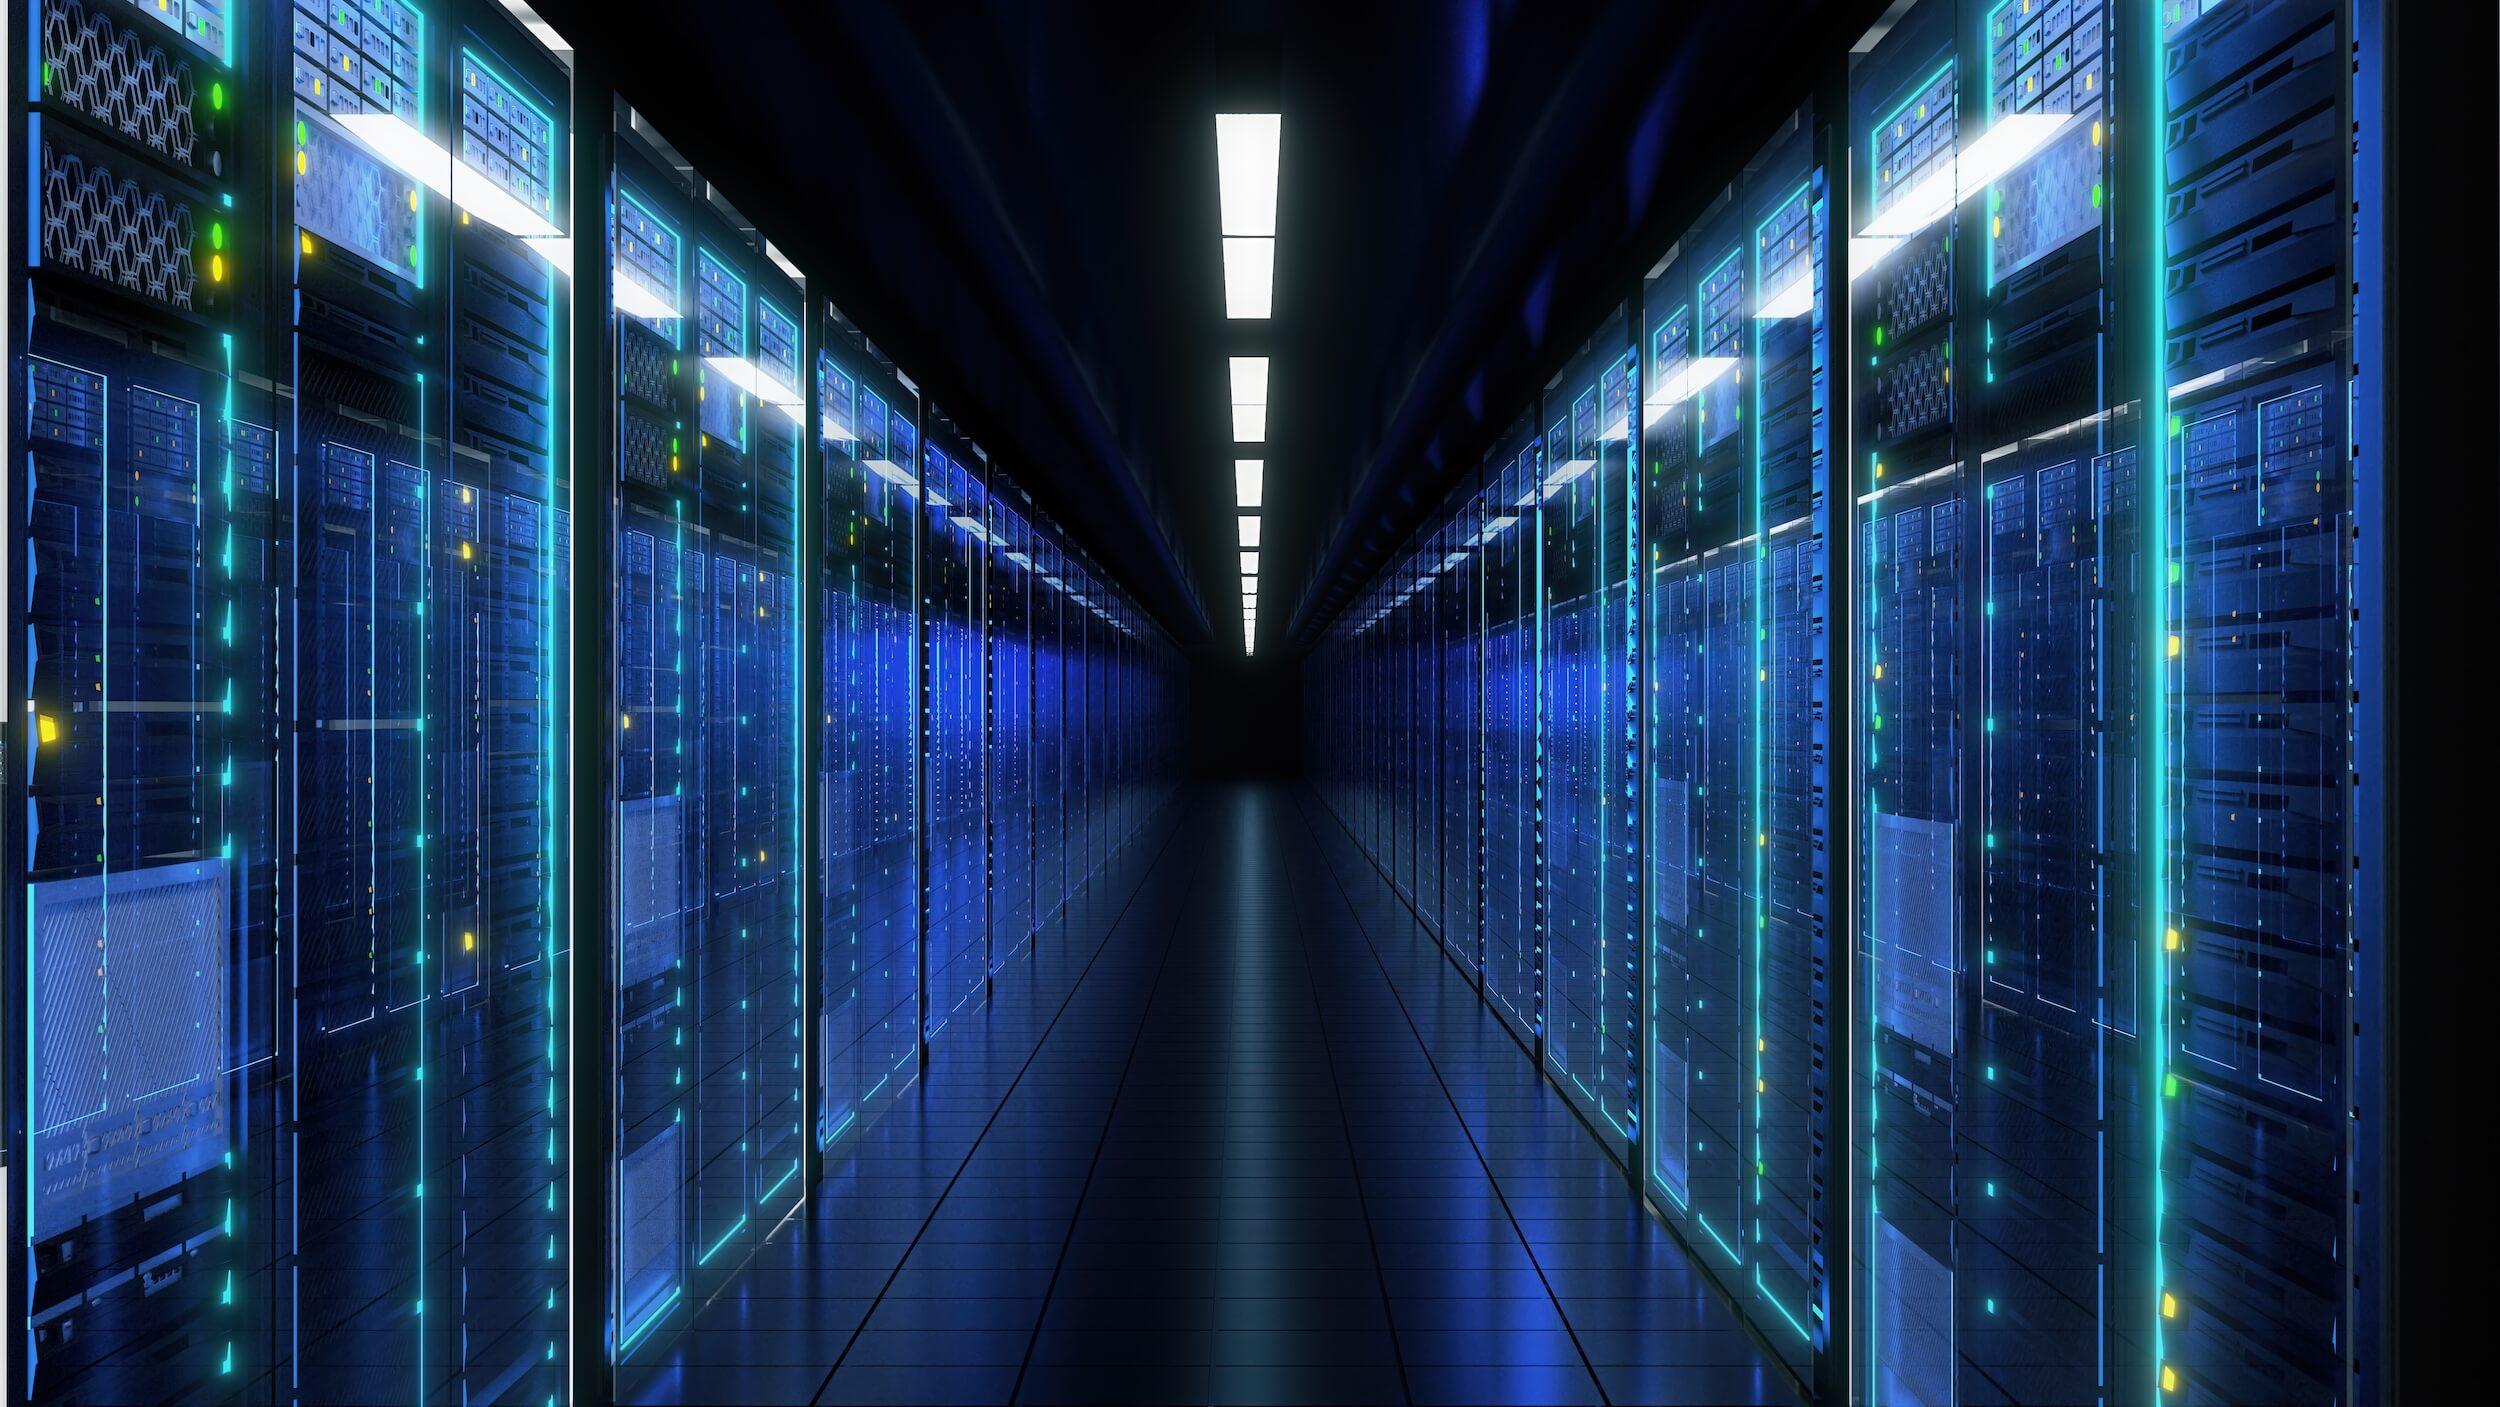 plan A Networks, Data Center, Big Data, Data Mining